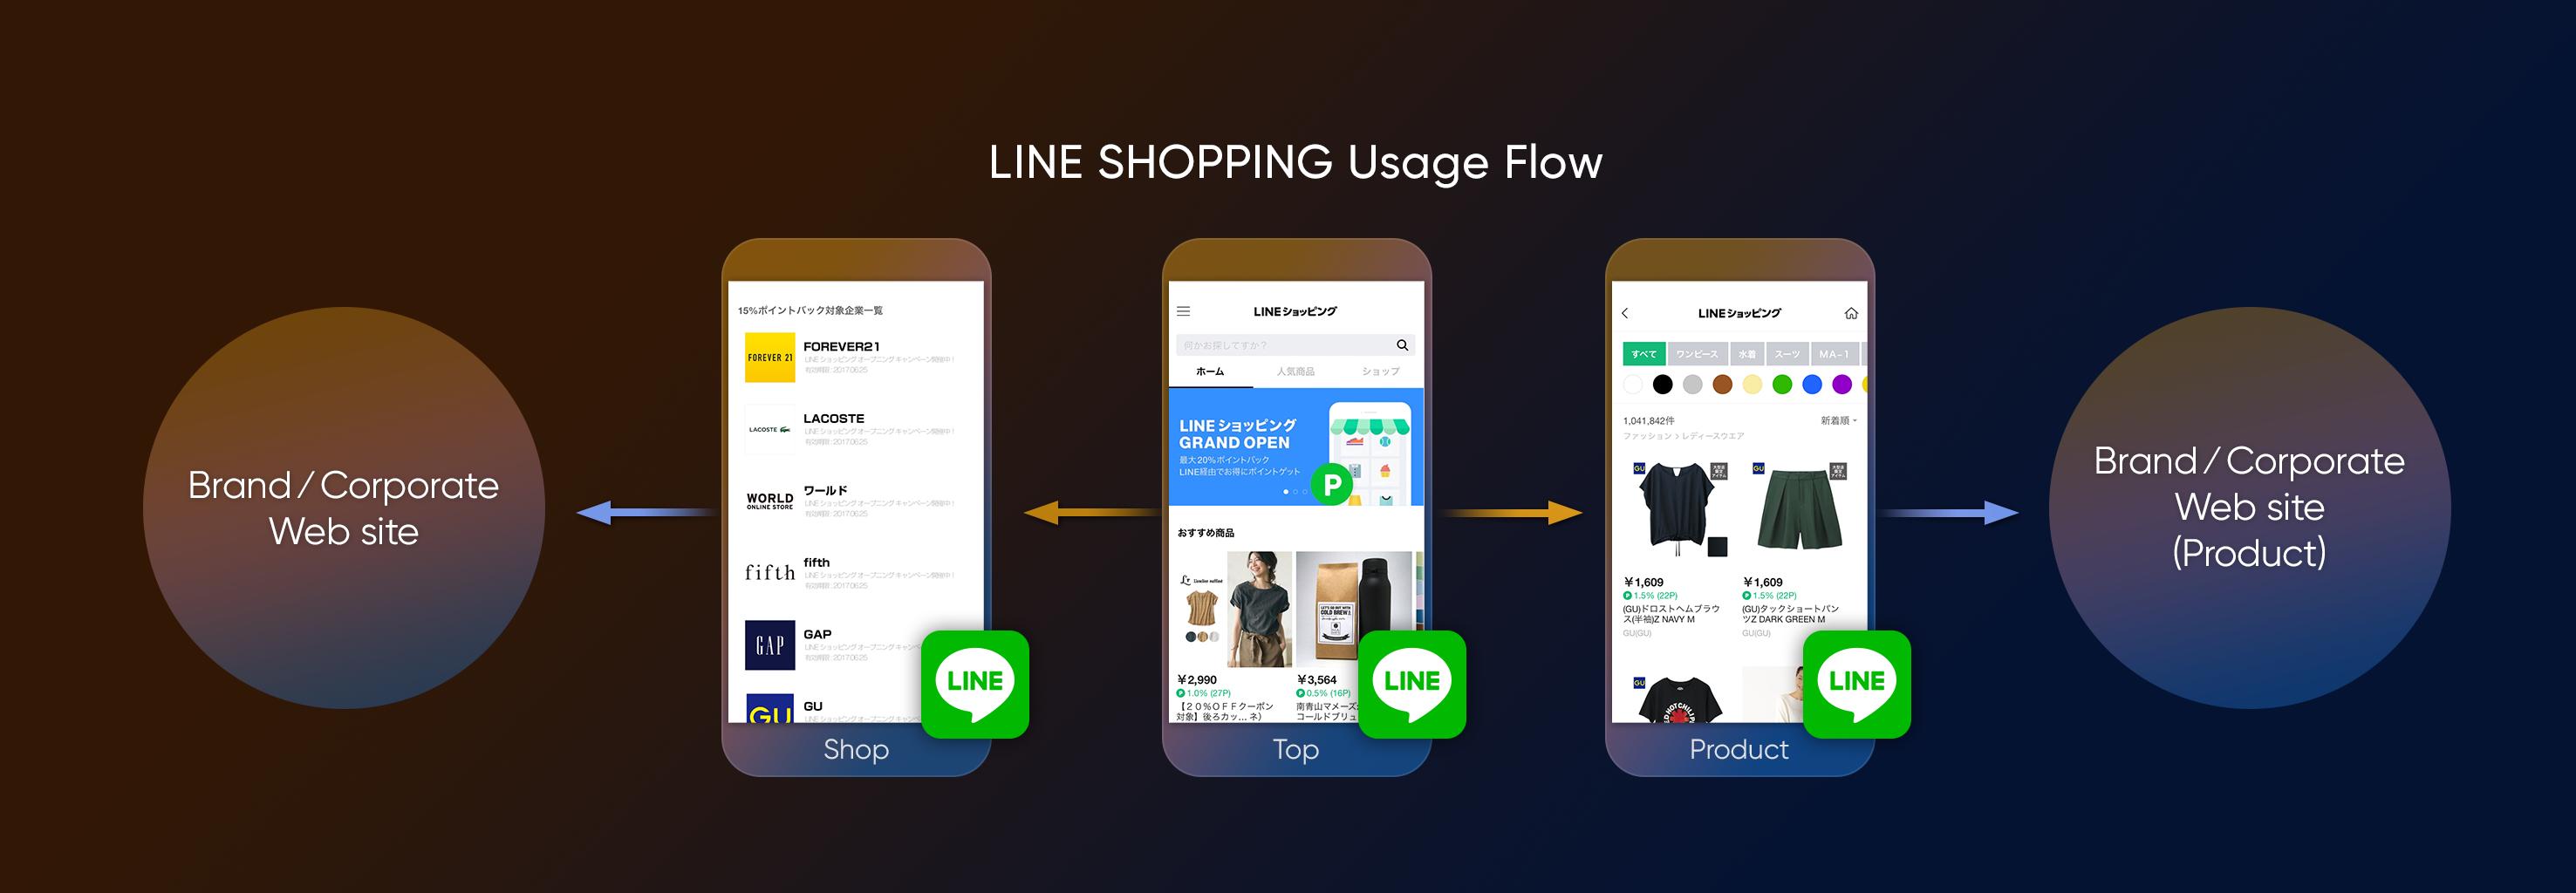 /stf/linecorp/en/pr/LINE_SHOPPING_02.png